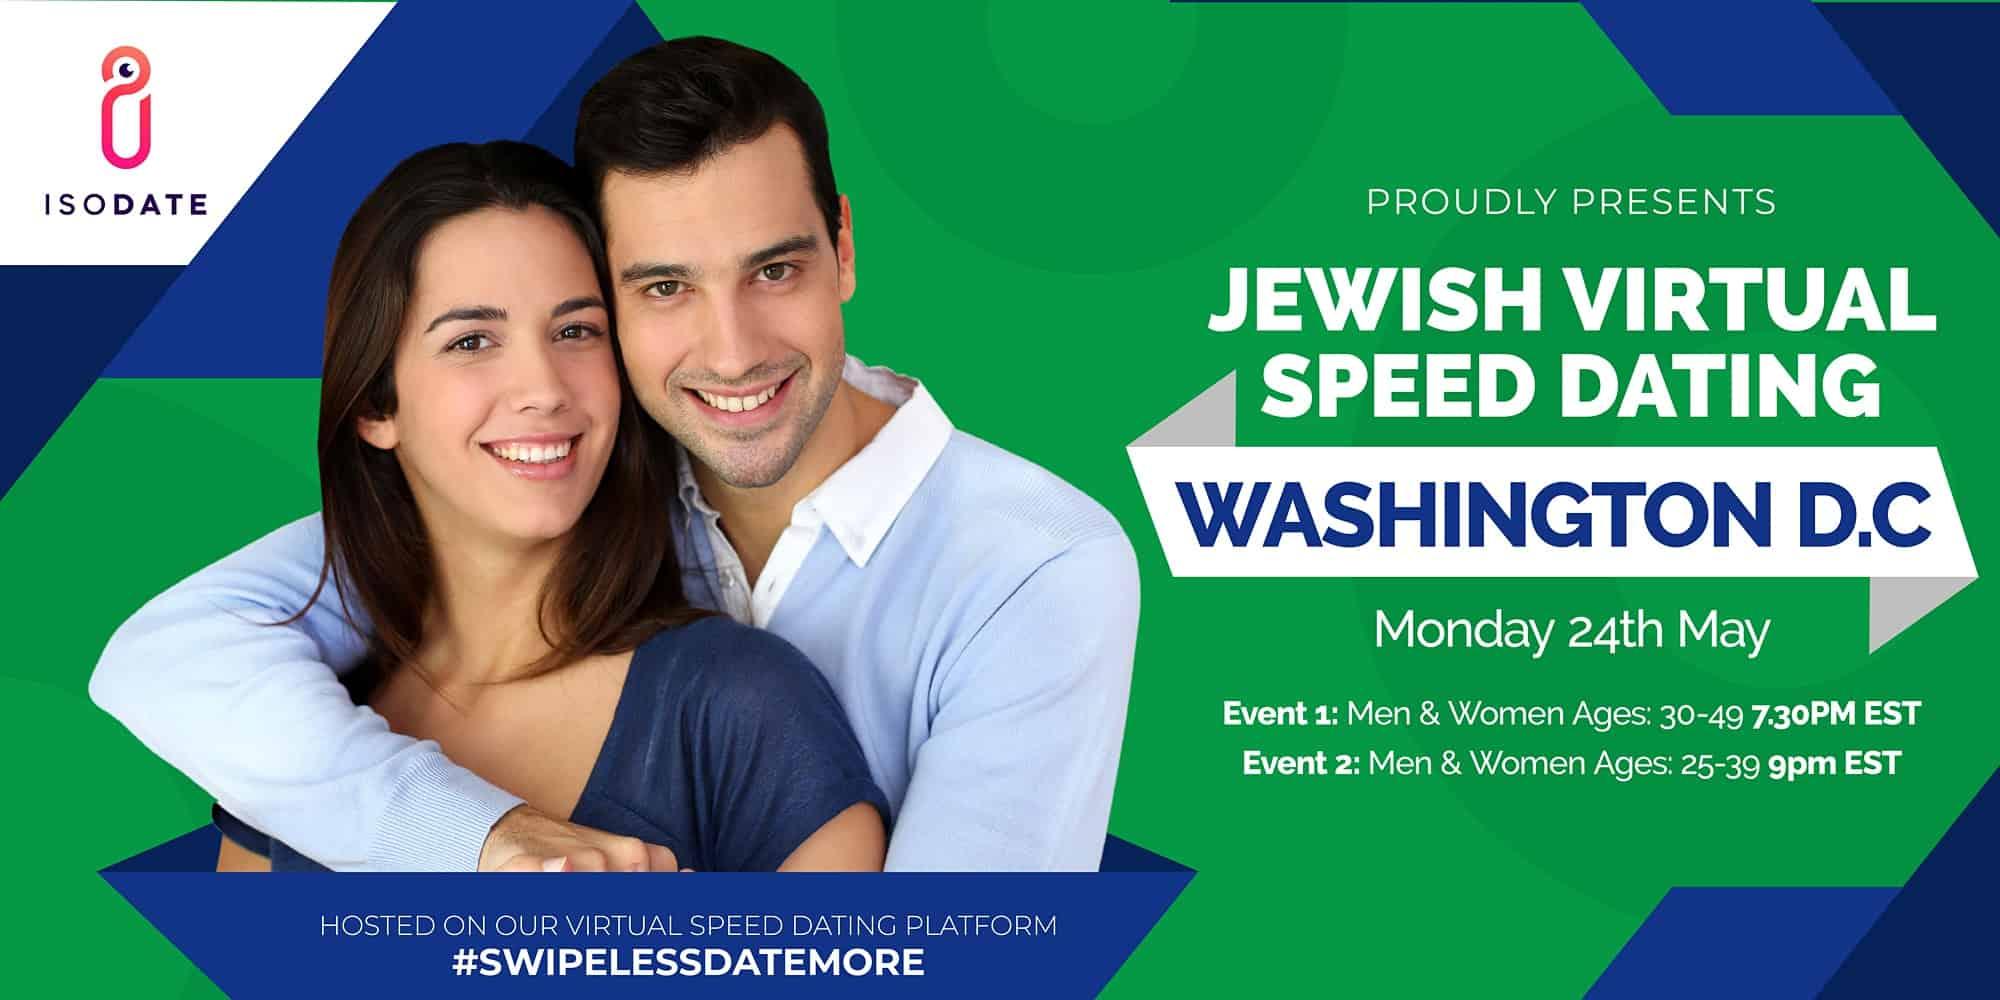 Isodate's Washington DC Jewish Virtual Speed Dating